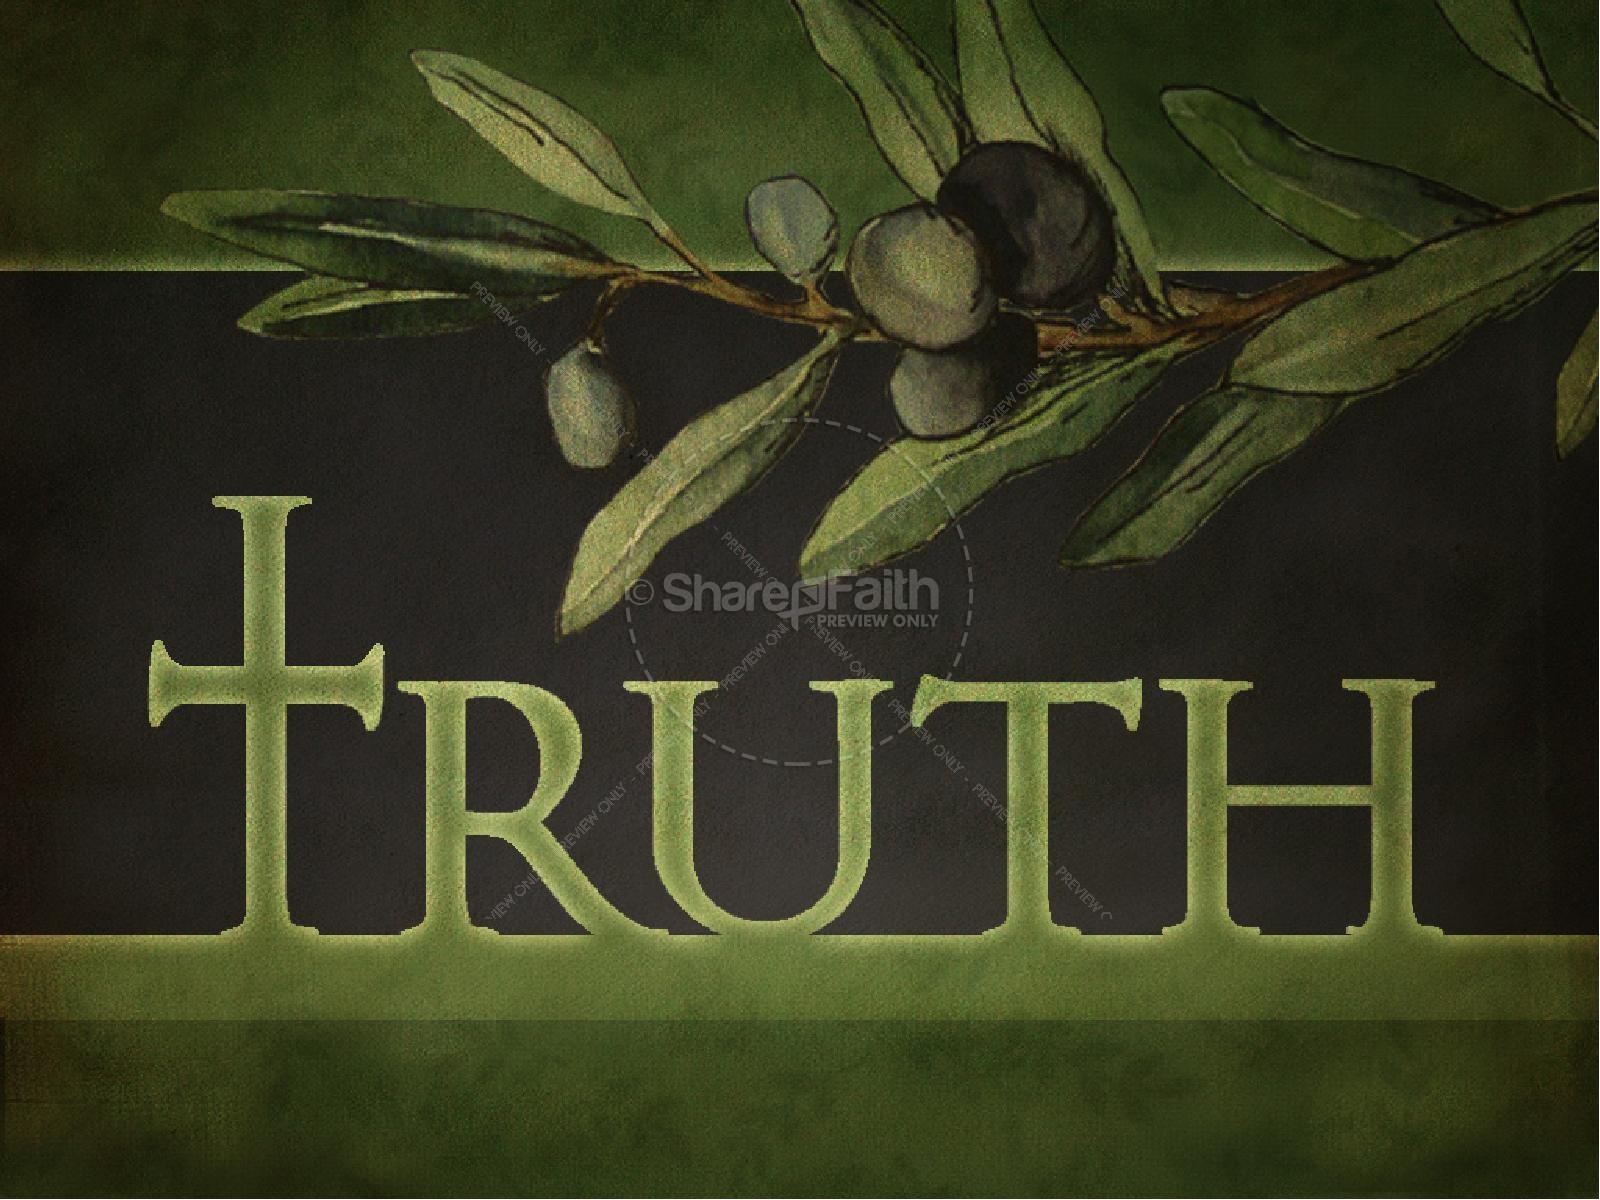 Truth PowerPoint | slide 1